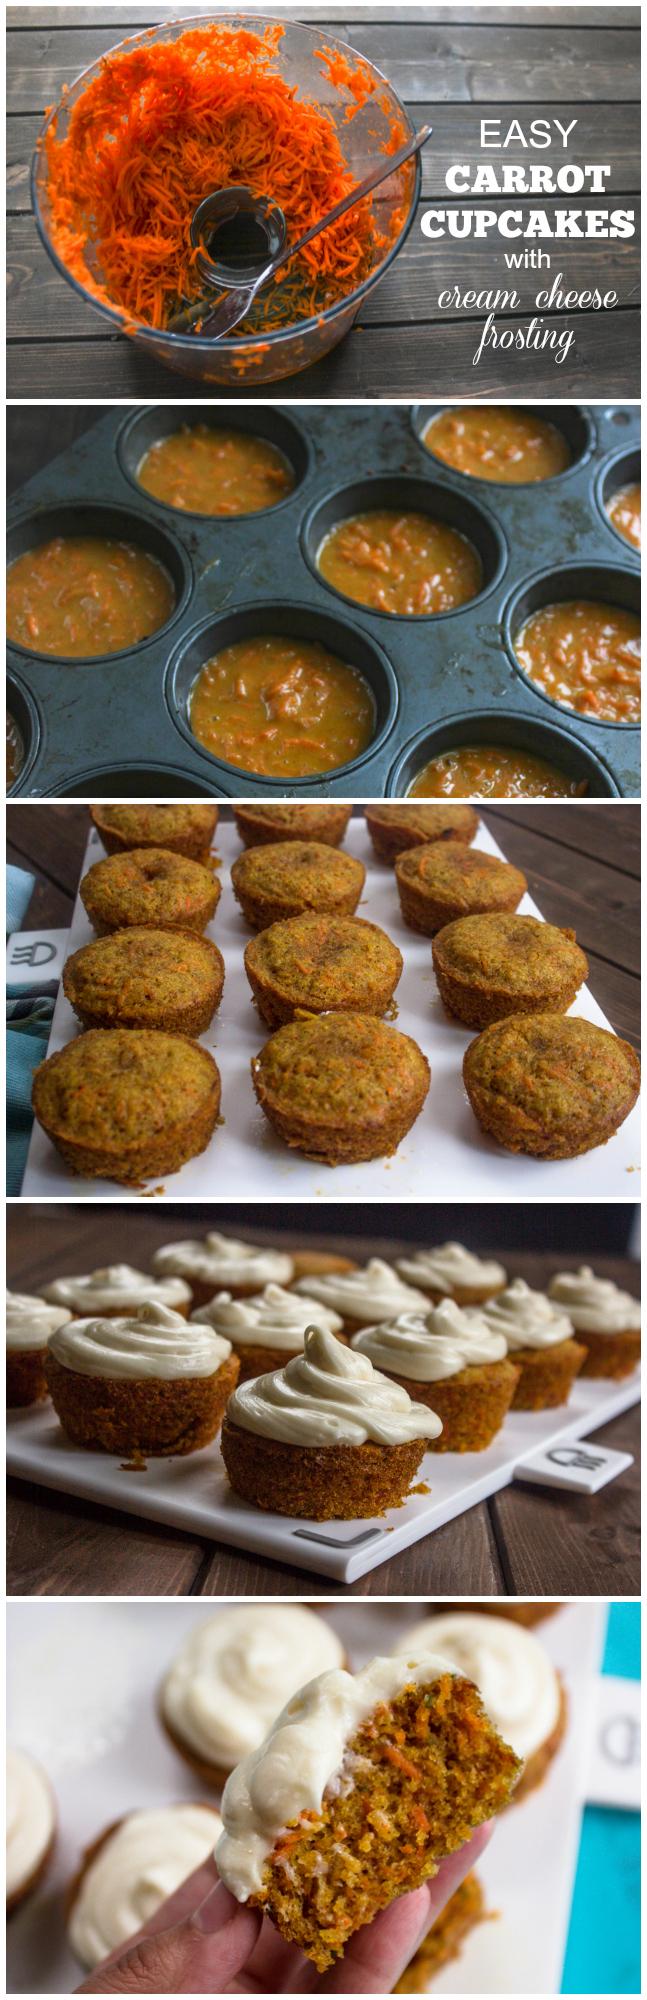 Simple carrot cake muffins recipe